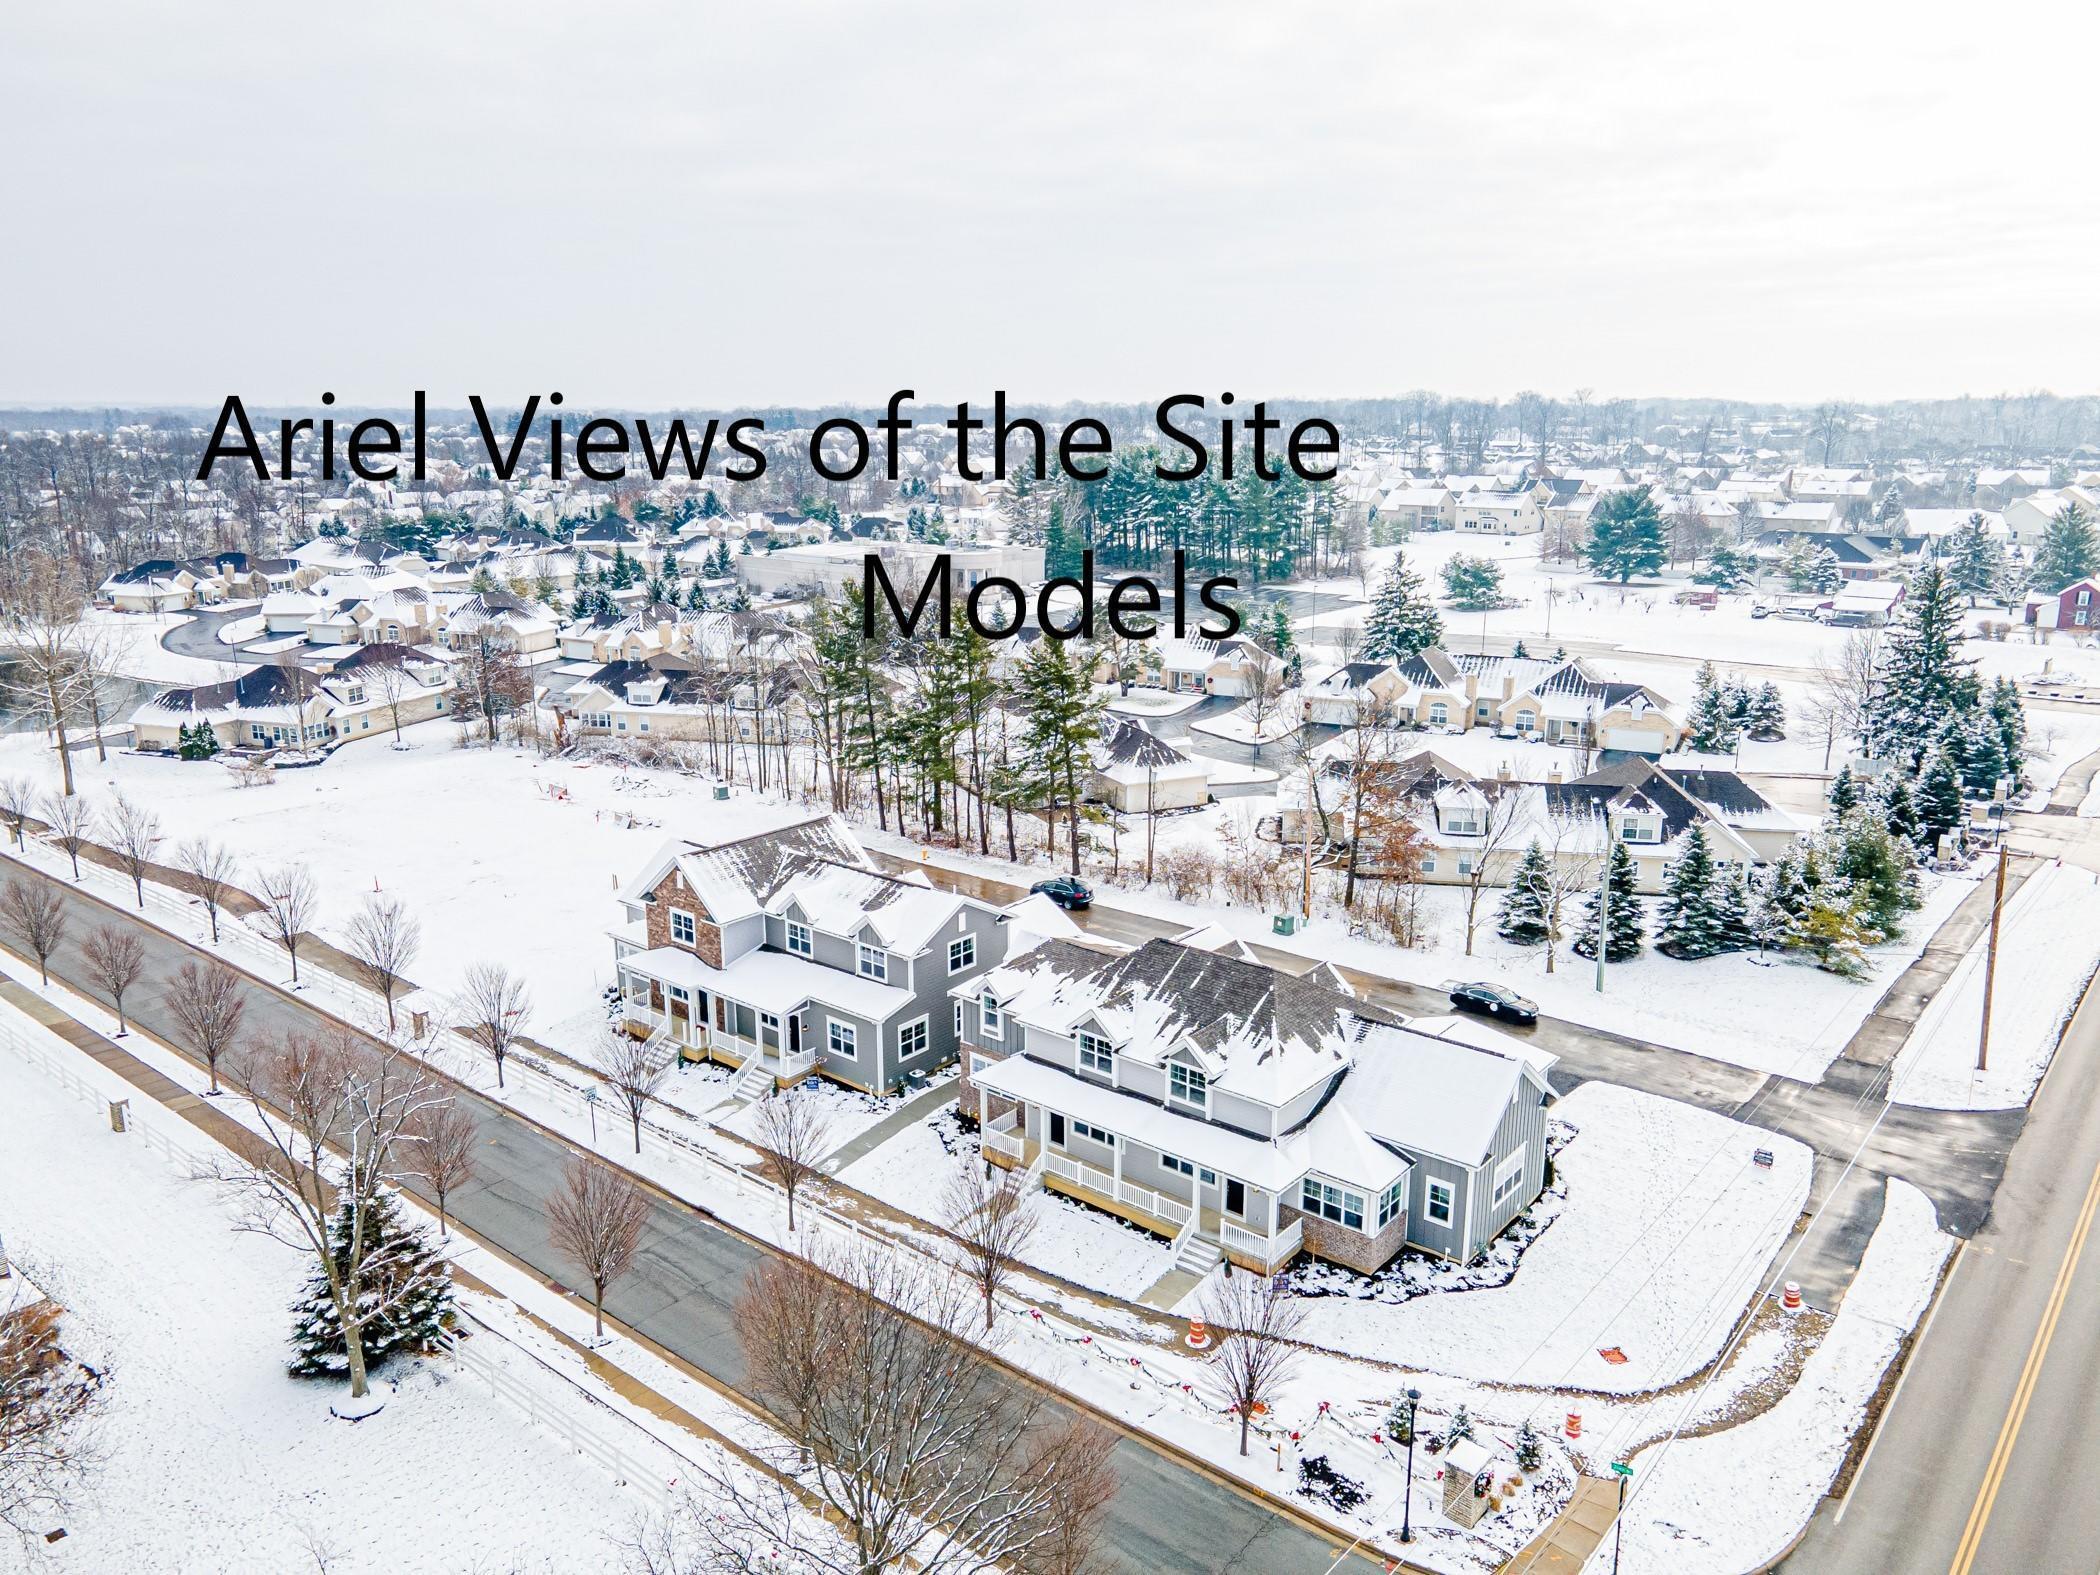 Ariel View of Models